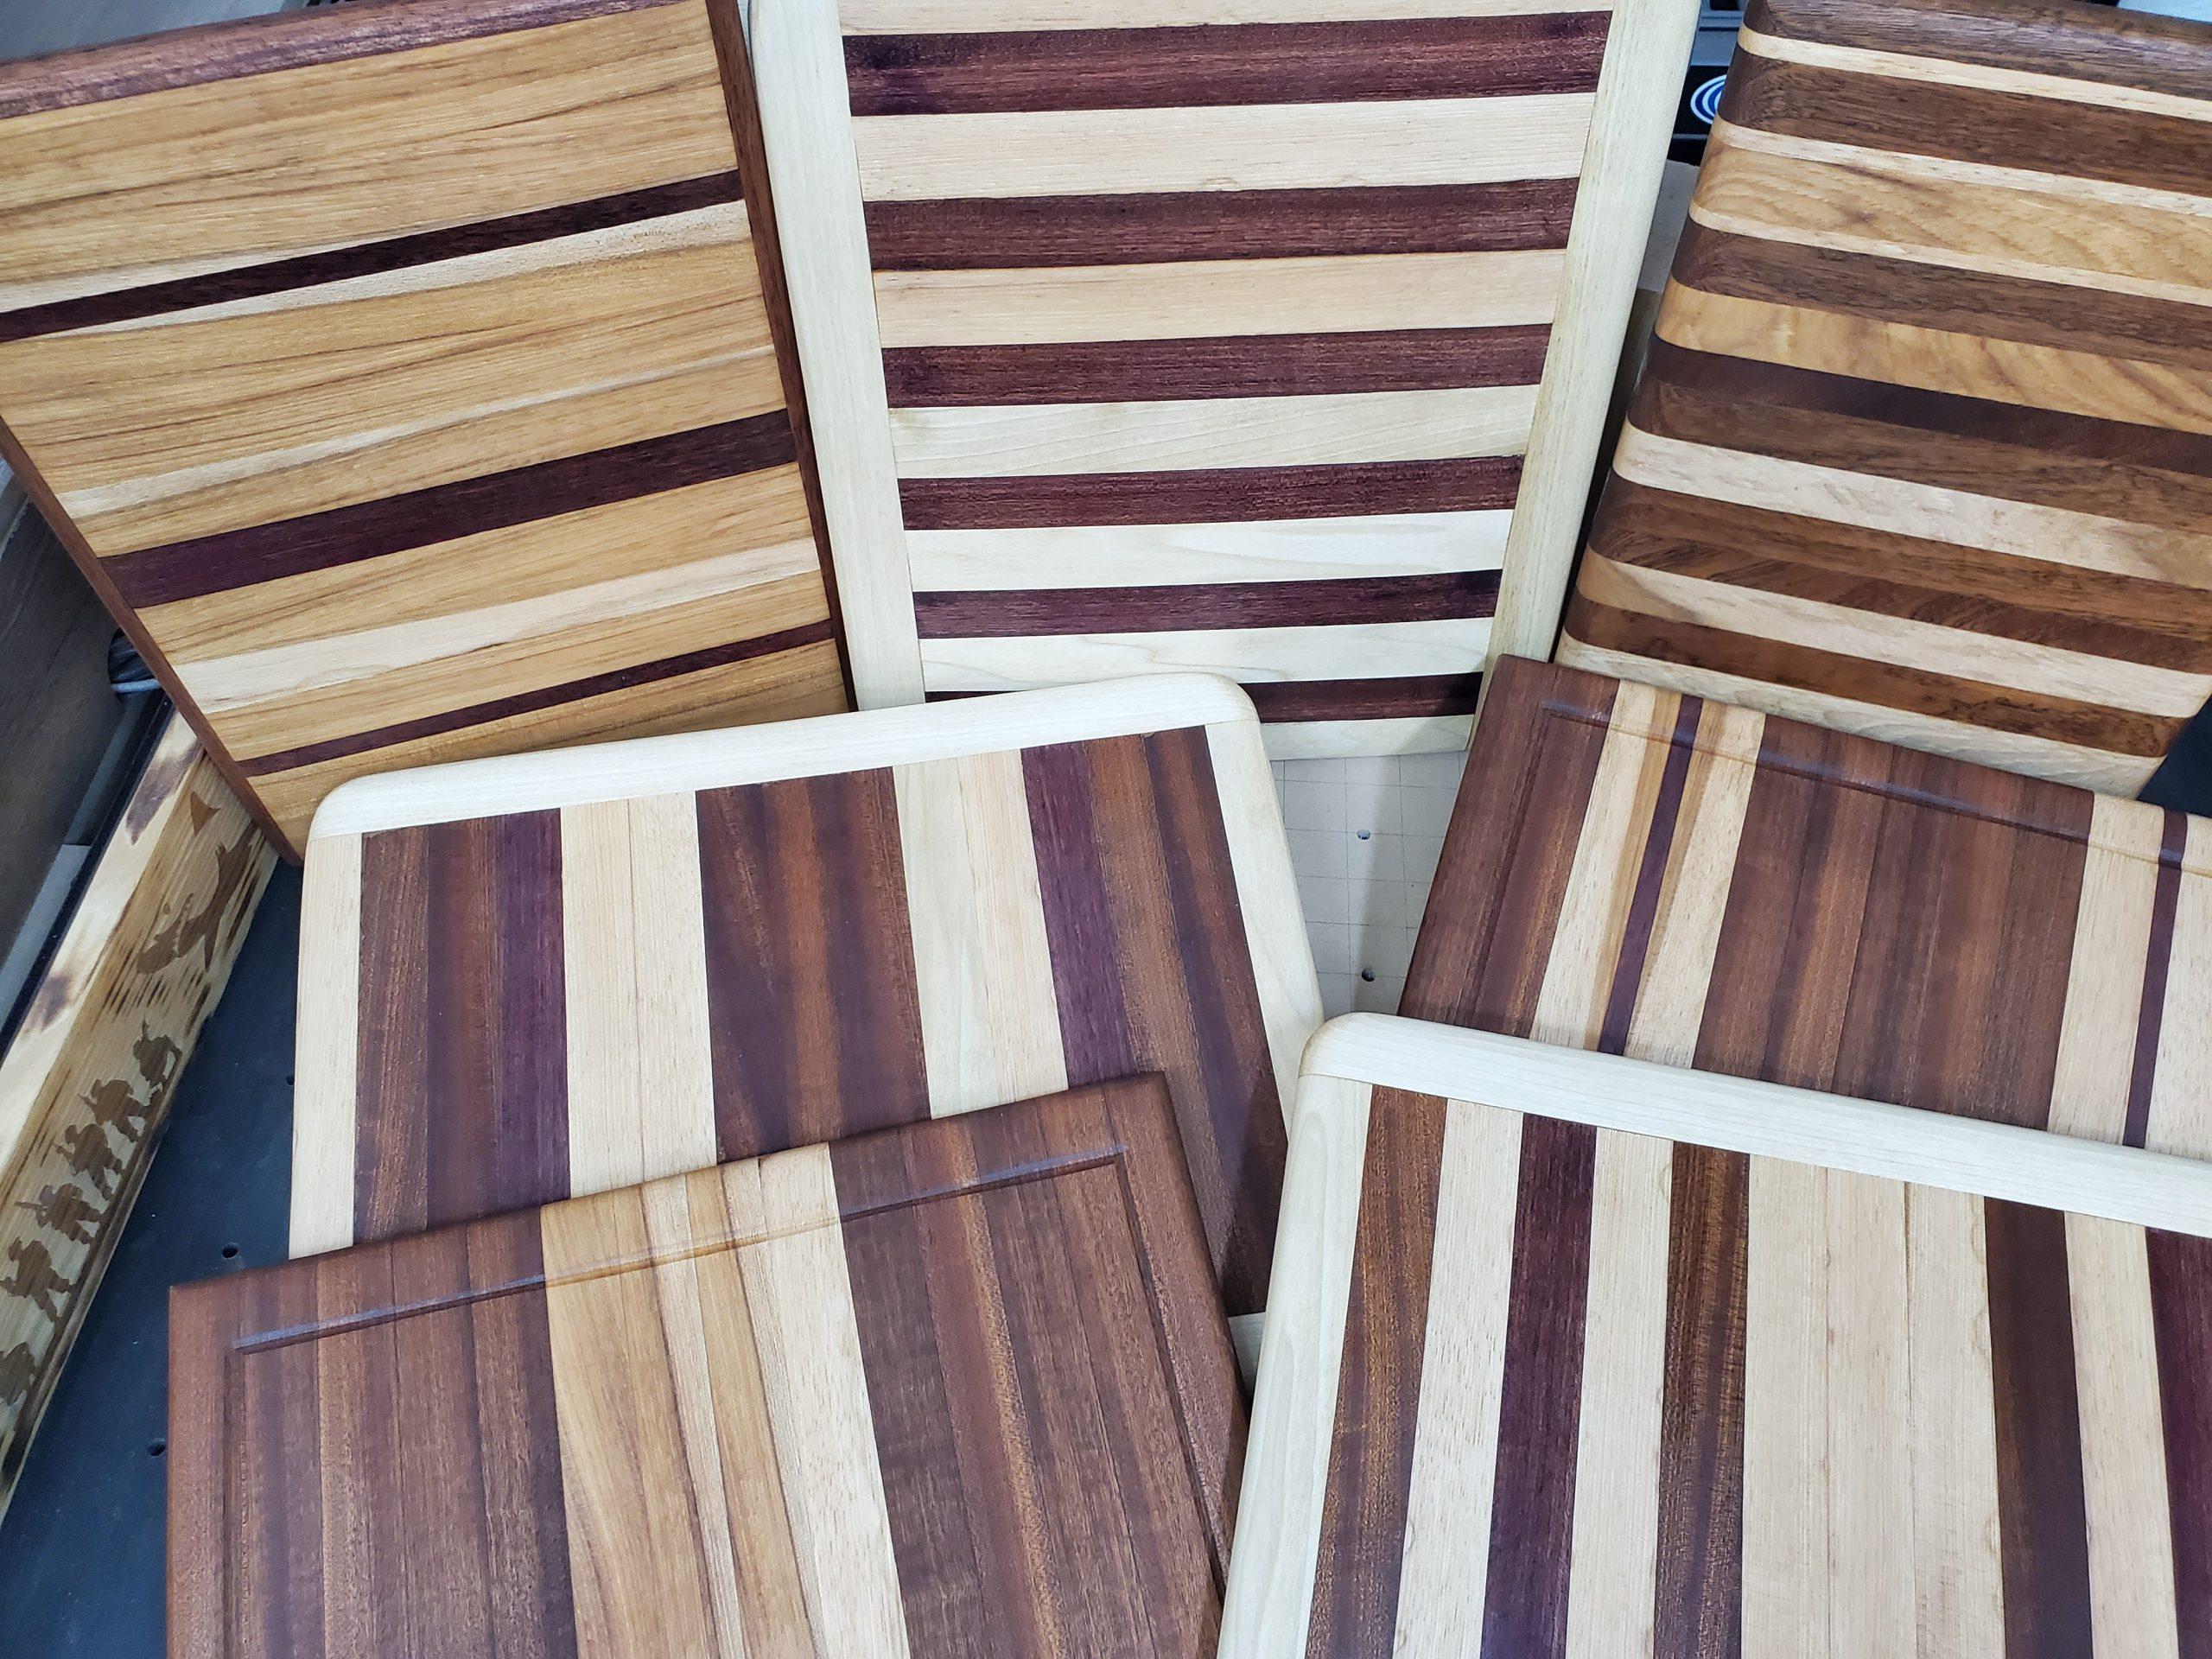 Cutting Boards